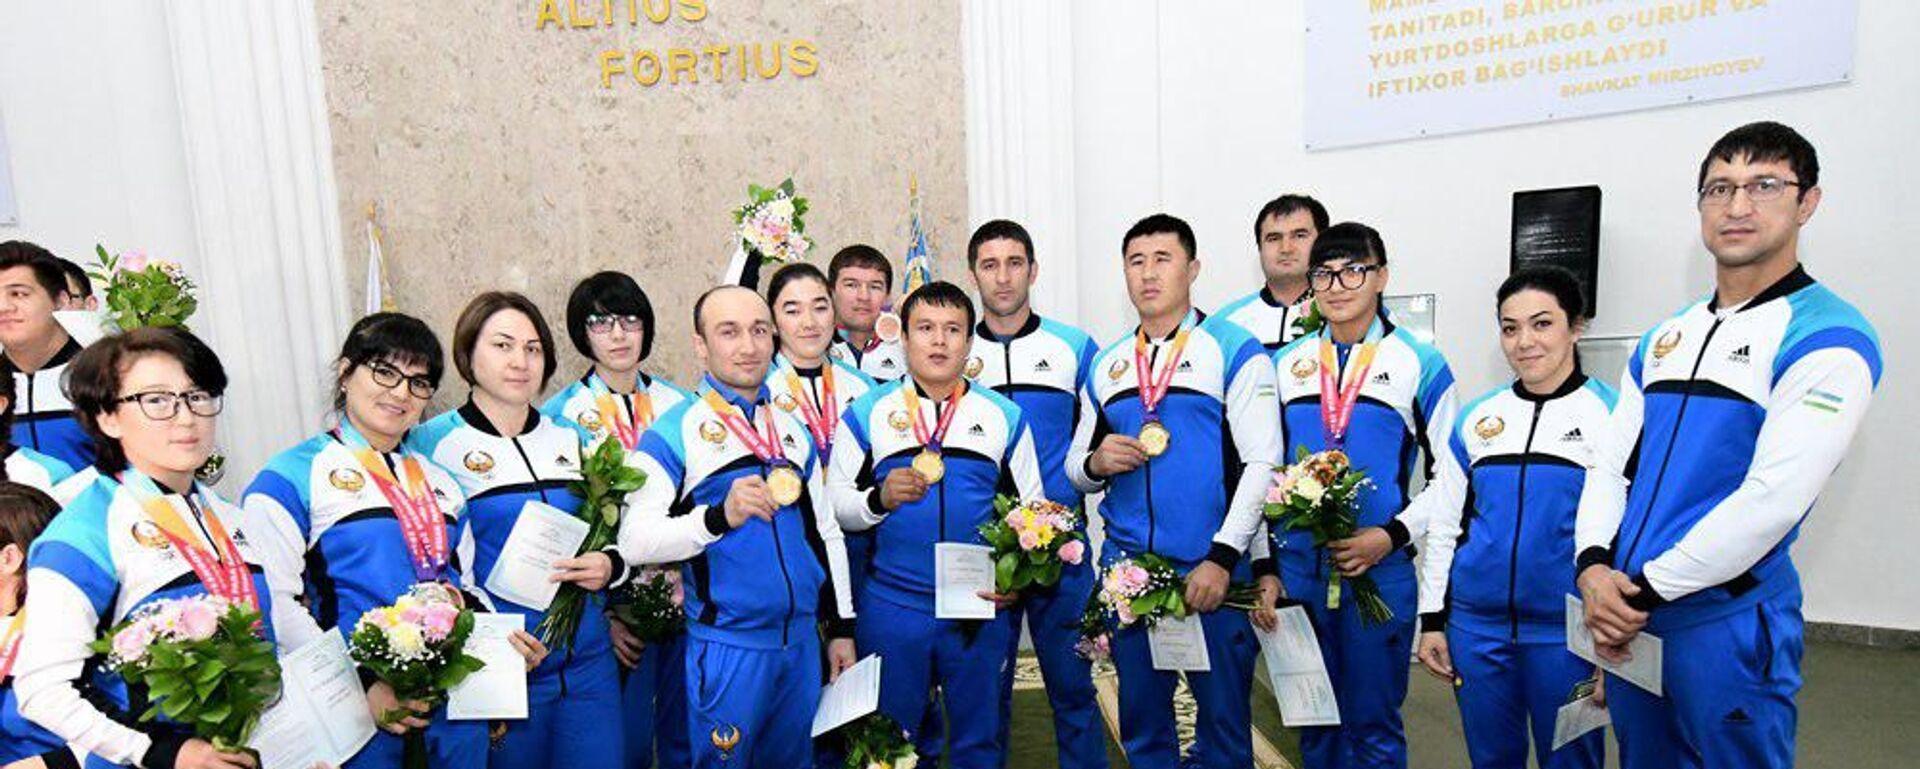 Паралимпийцы Узбекистана получили награды от президента - Sputnik Узбекистан, 1920, 18.08.2021